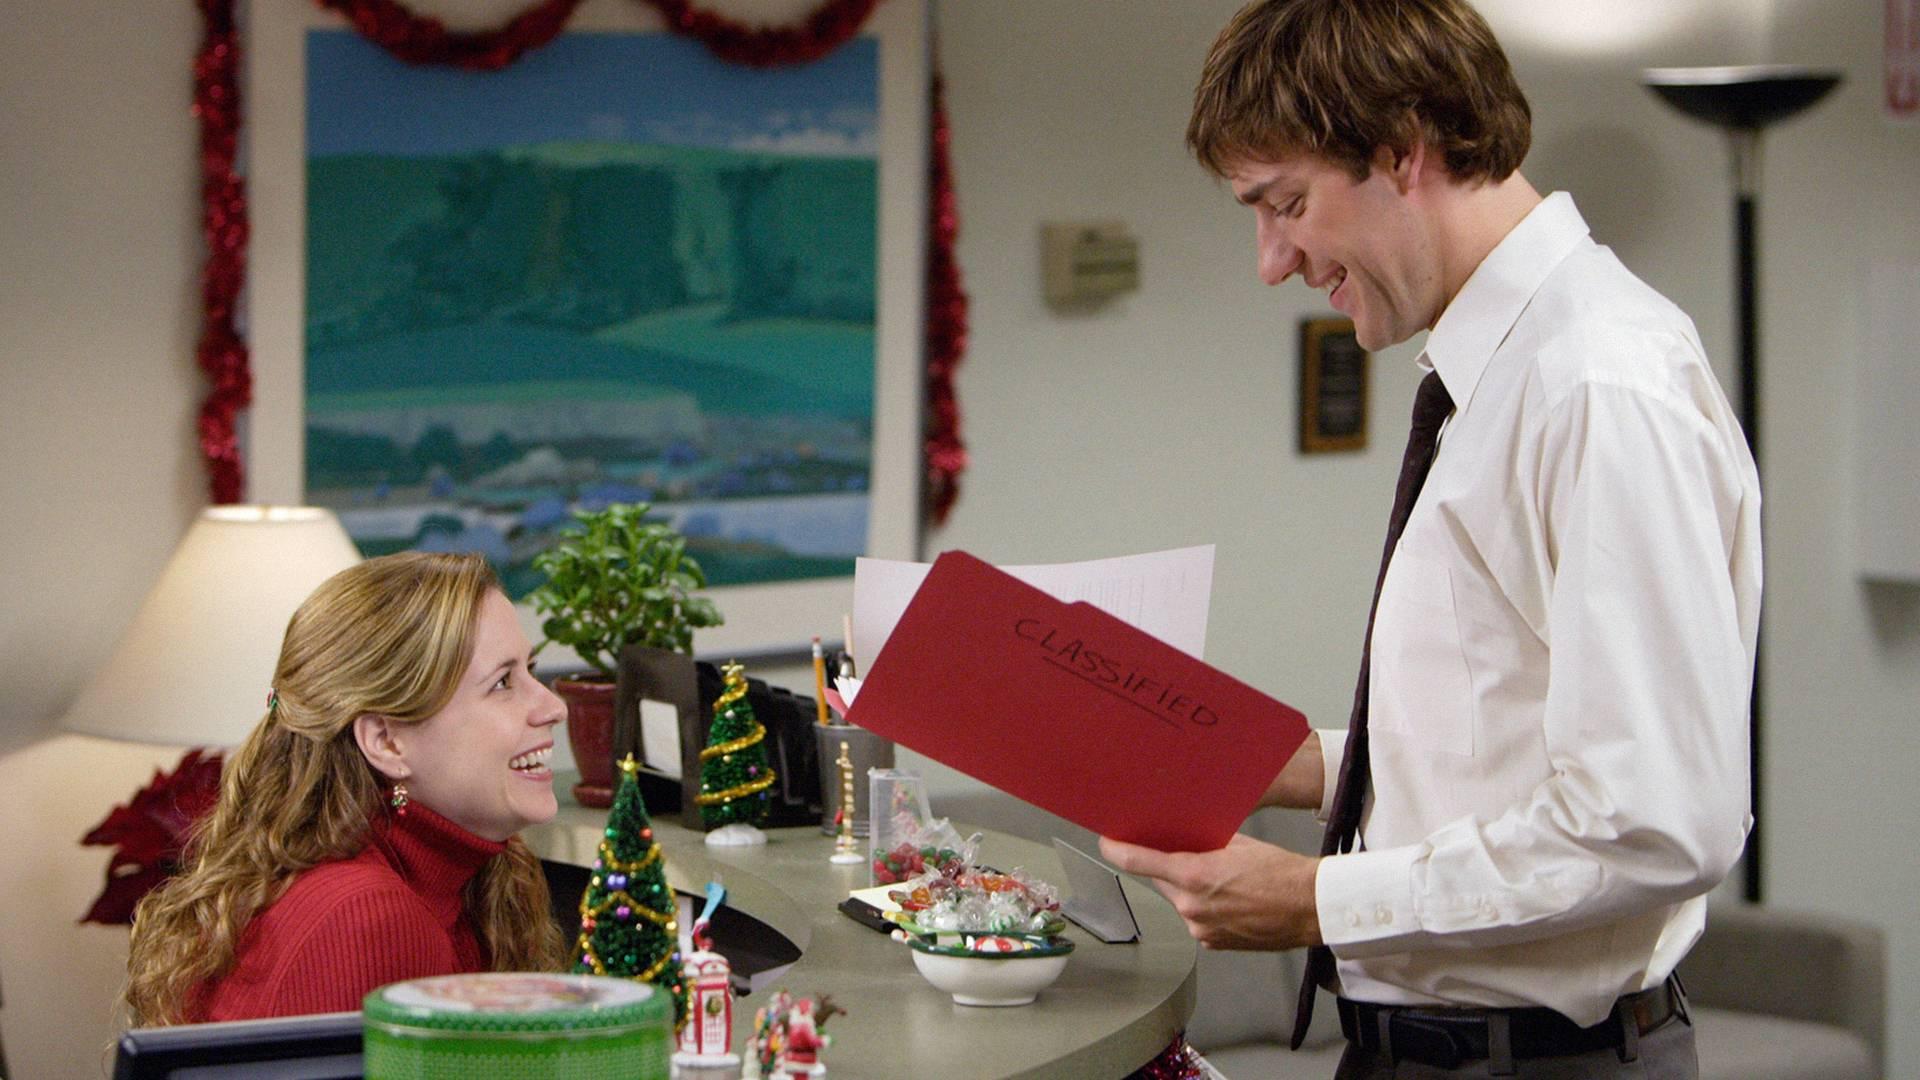 The Office Season 3 Episode 10